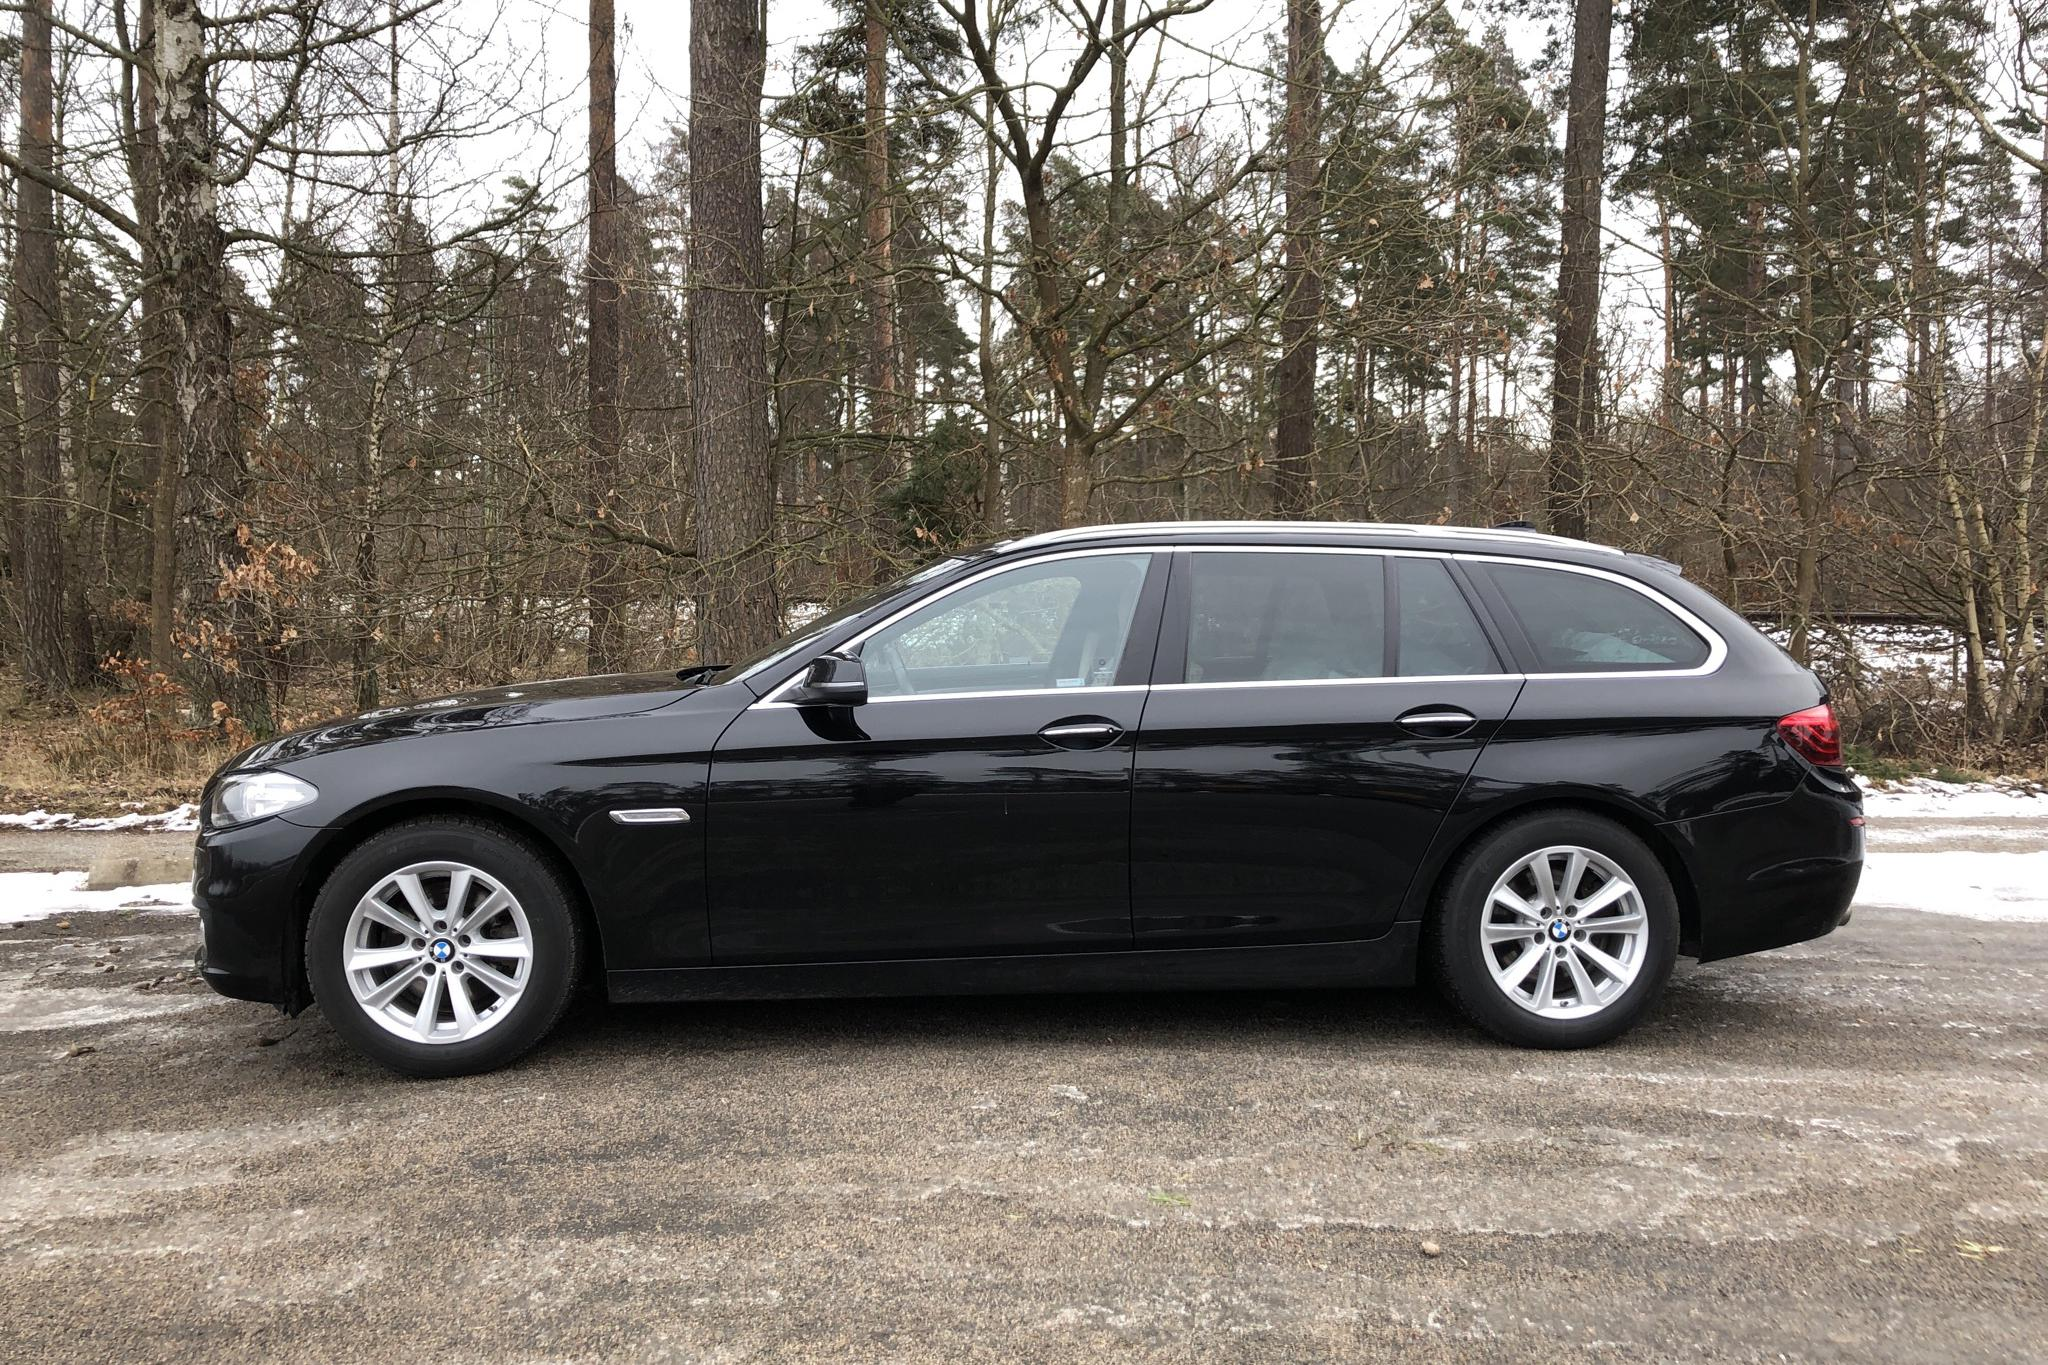 BMW 520d xDrive Touring, F11 (190hk) - 10 563 mil - Automat - svart - 2016